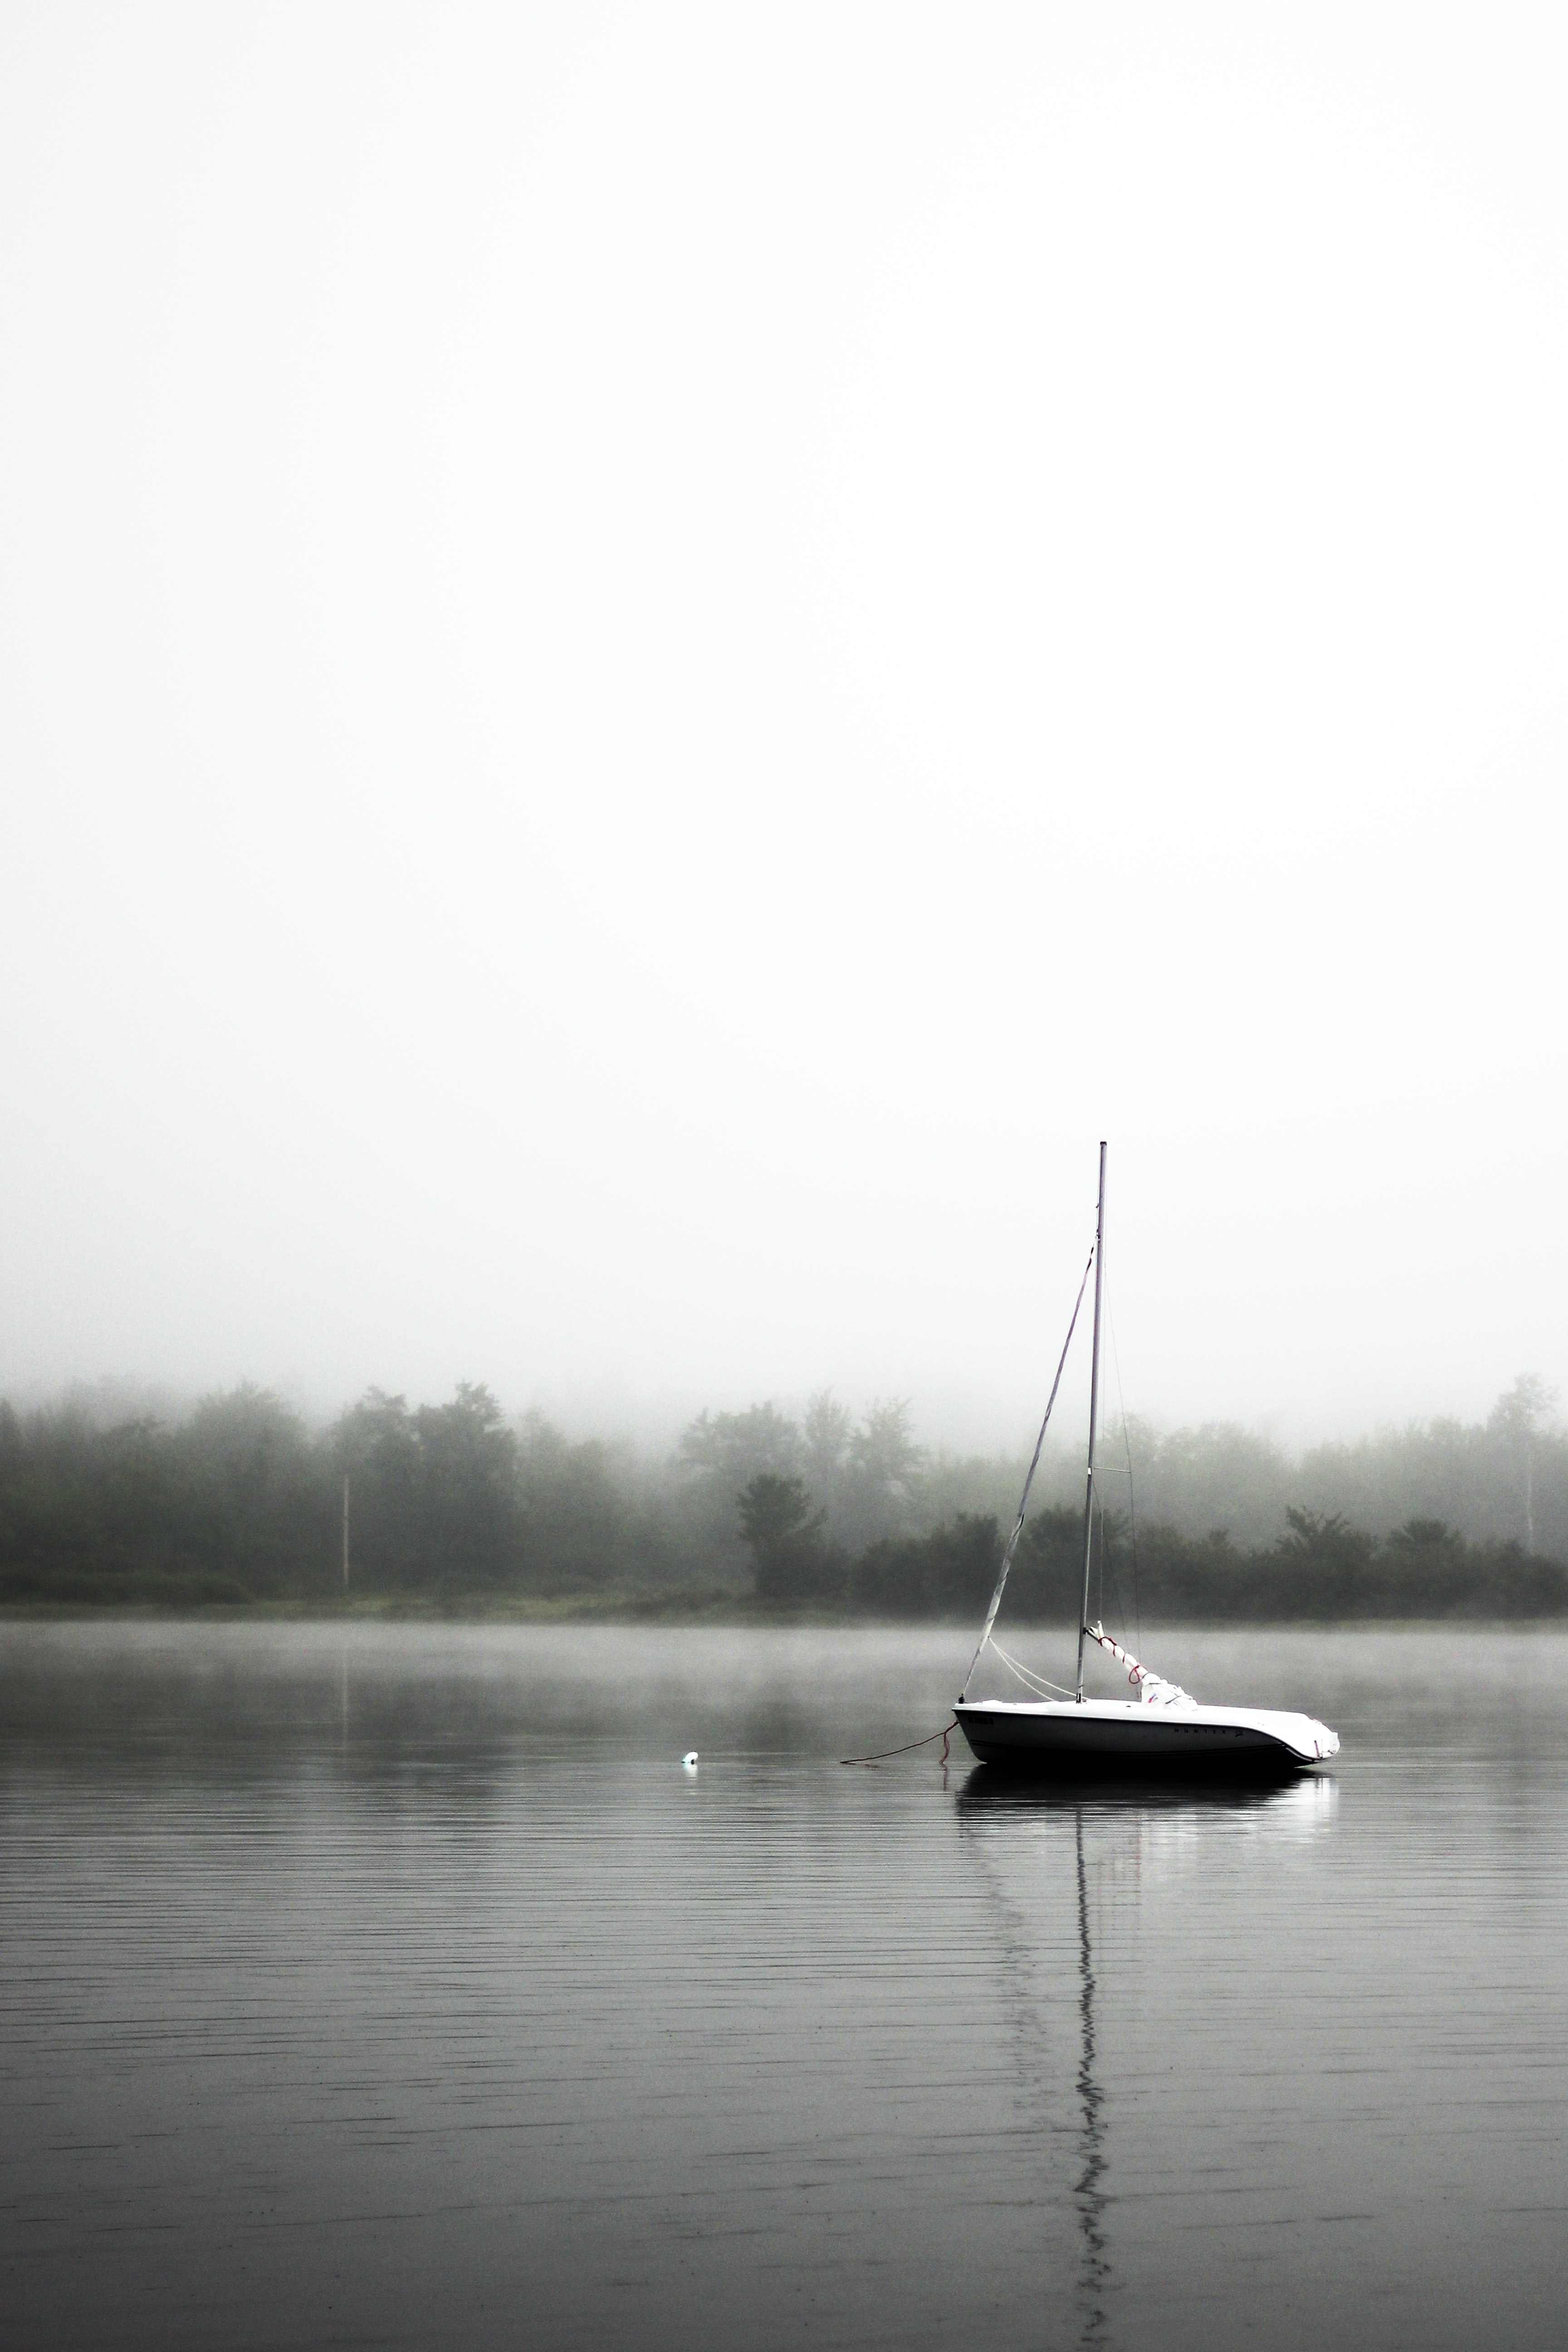 Sailboat sitting on a still lake on a foggy day